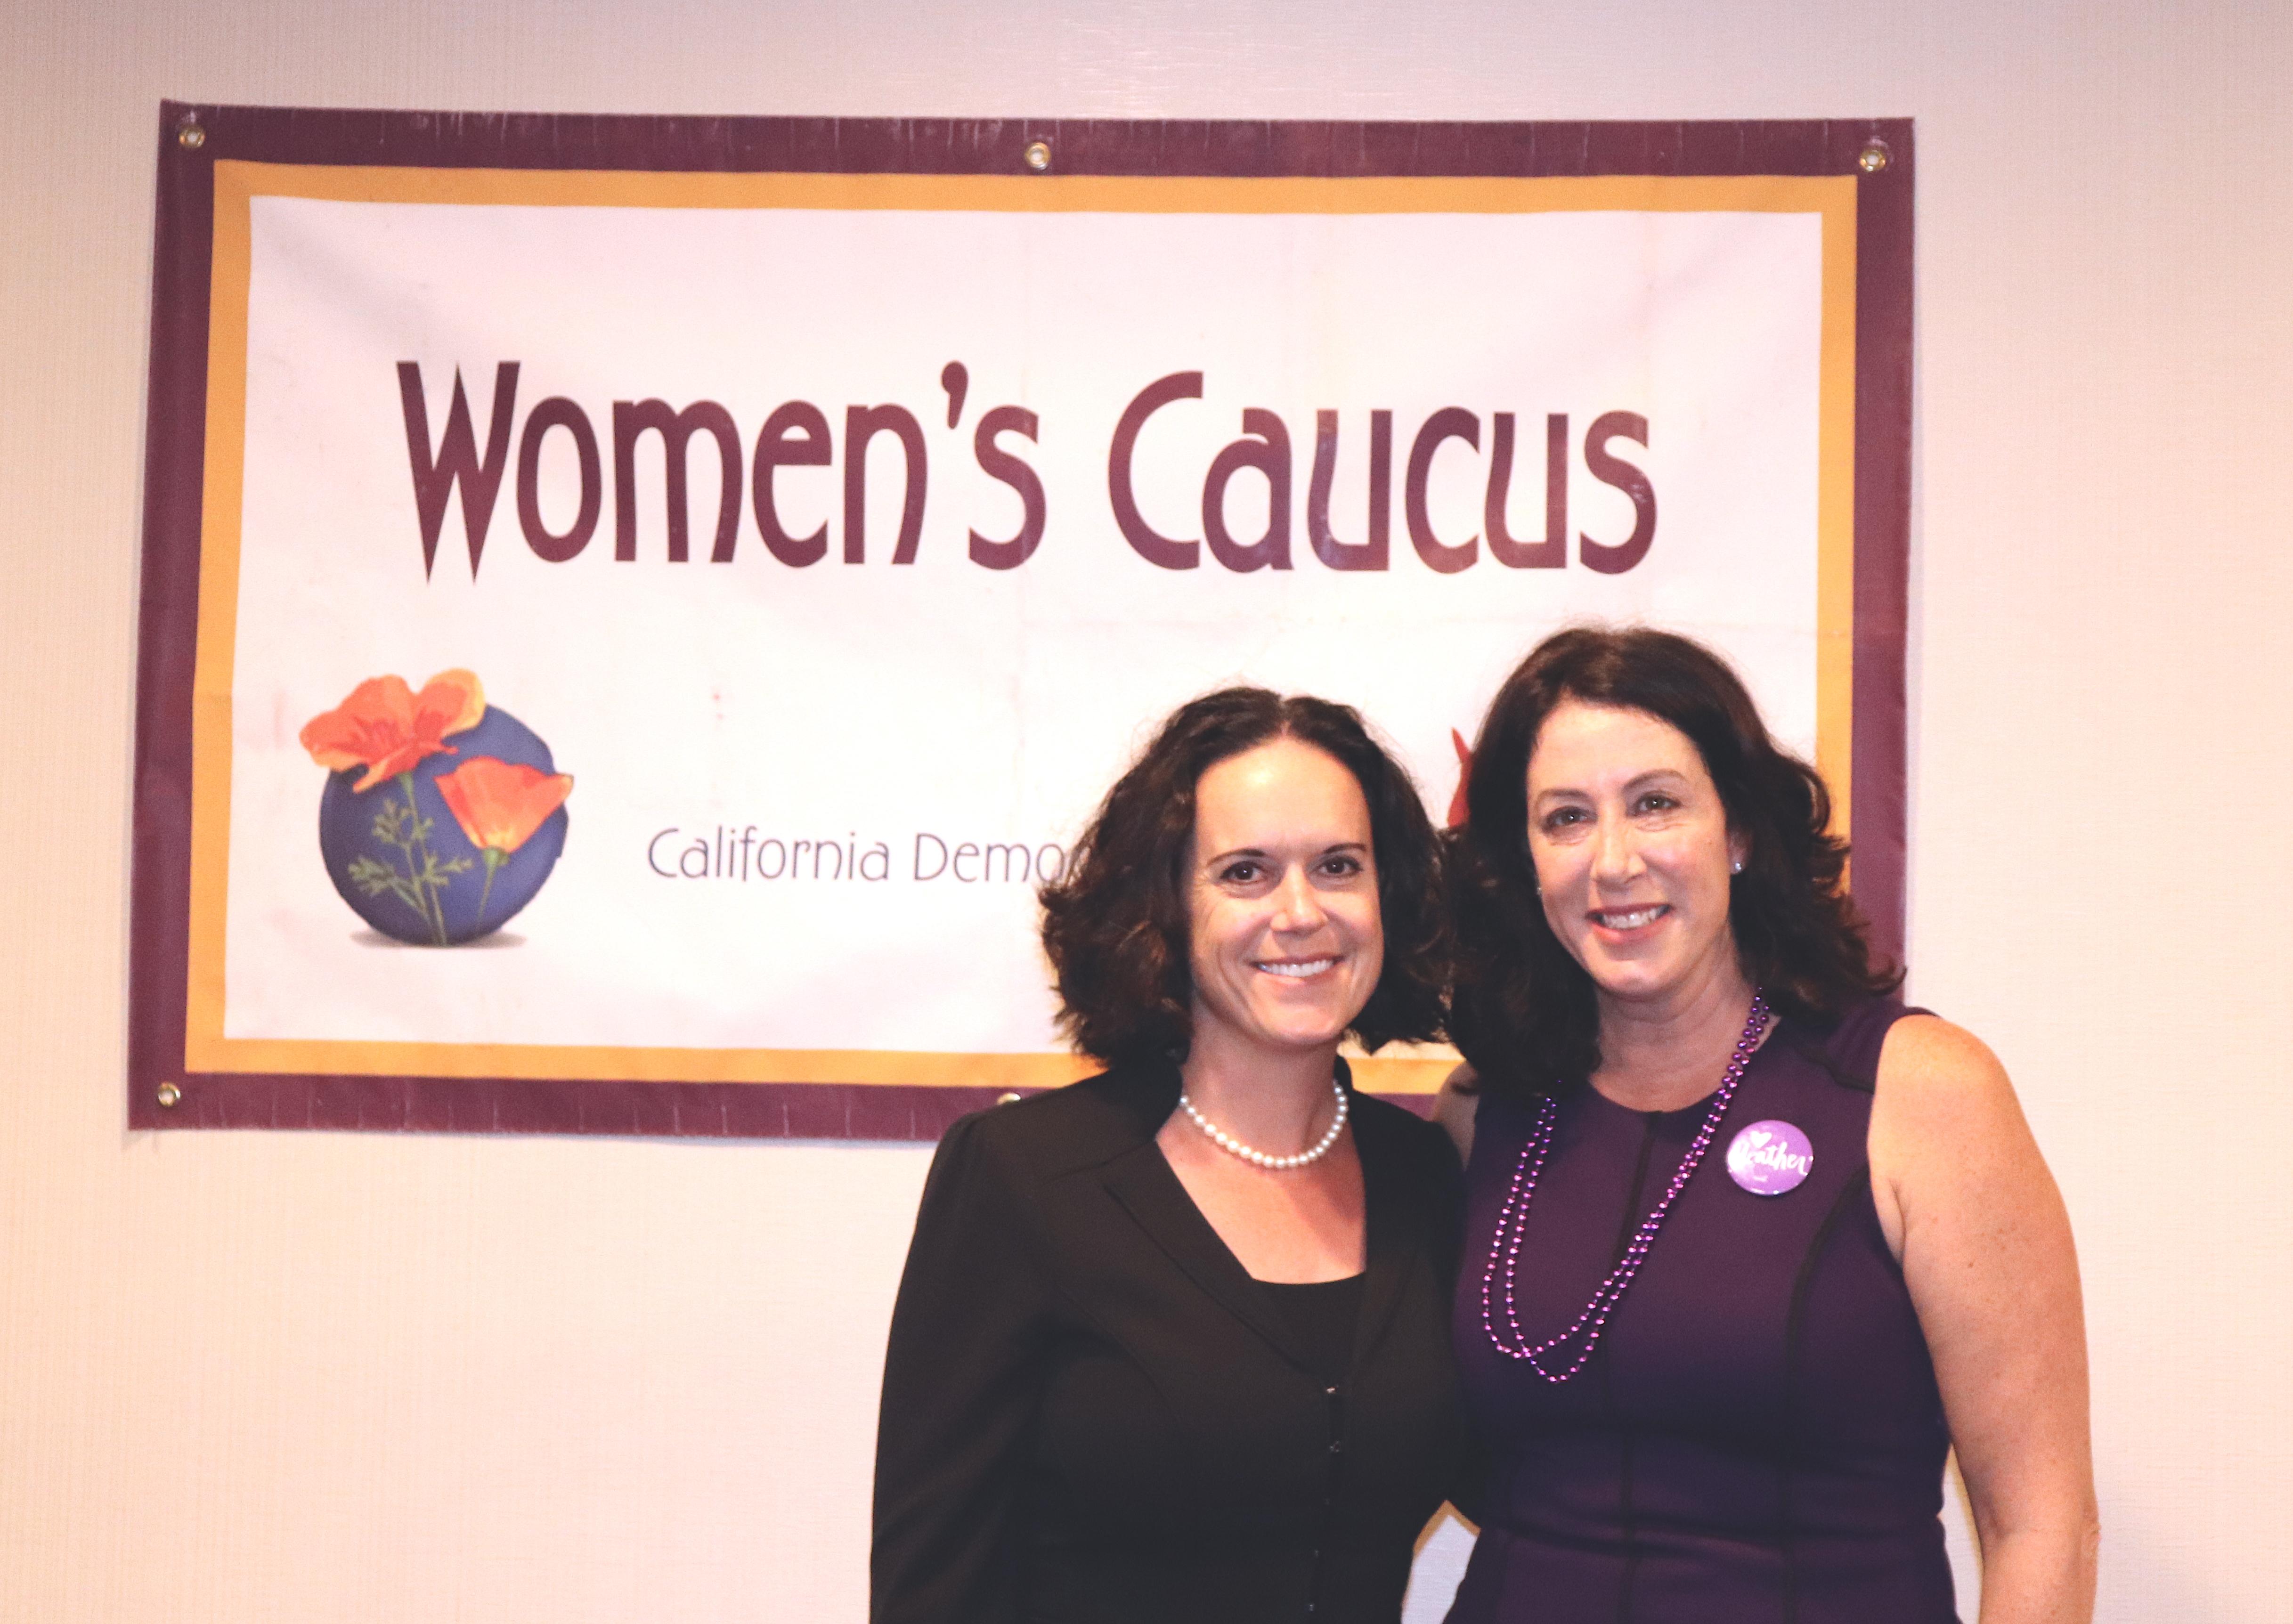 WomensCaucus1-08-26-17.JPG